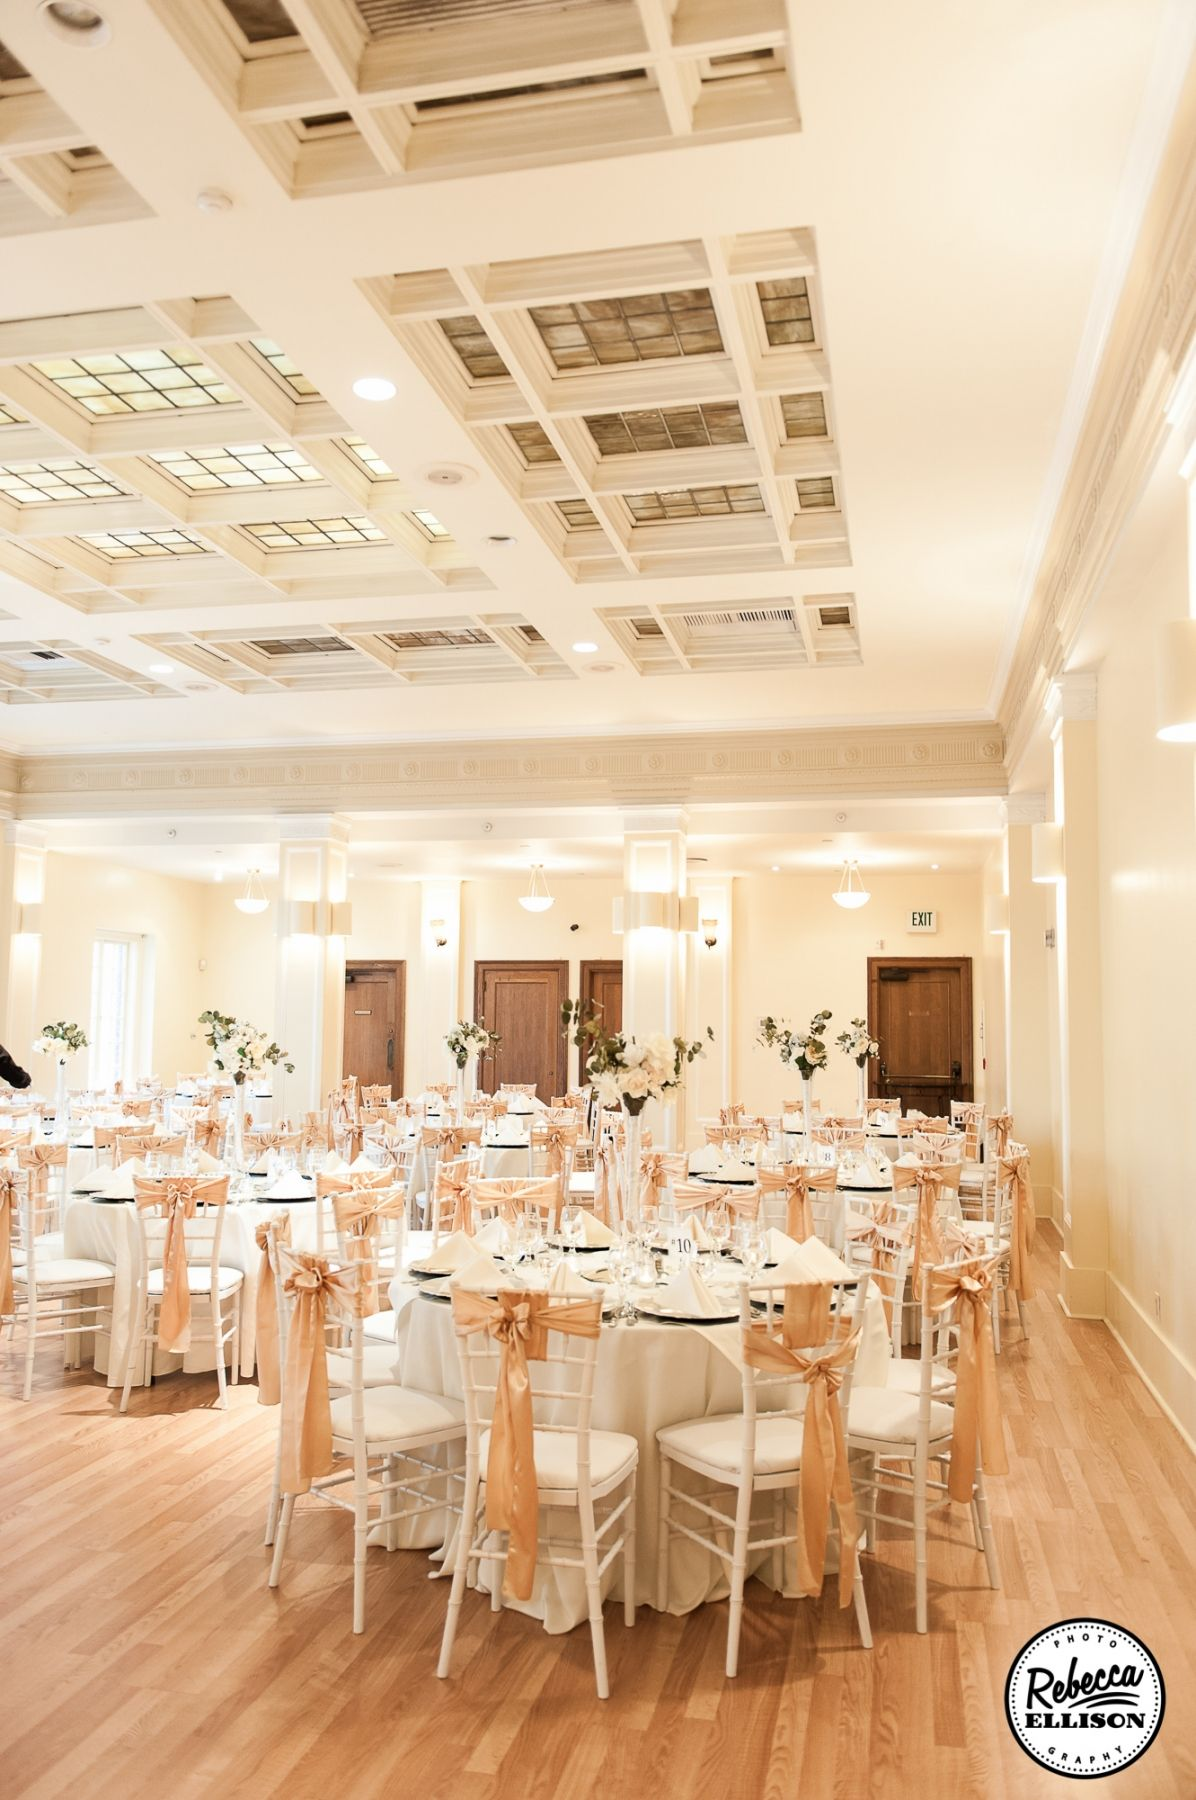 Pleasing Monte Cristo Ballroom Everett Wa Weddings In Snohomish County Short Hairstyles For Black Women Fulllsitofus